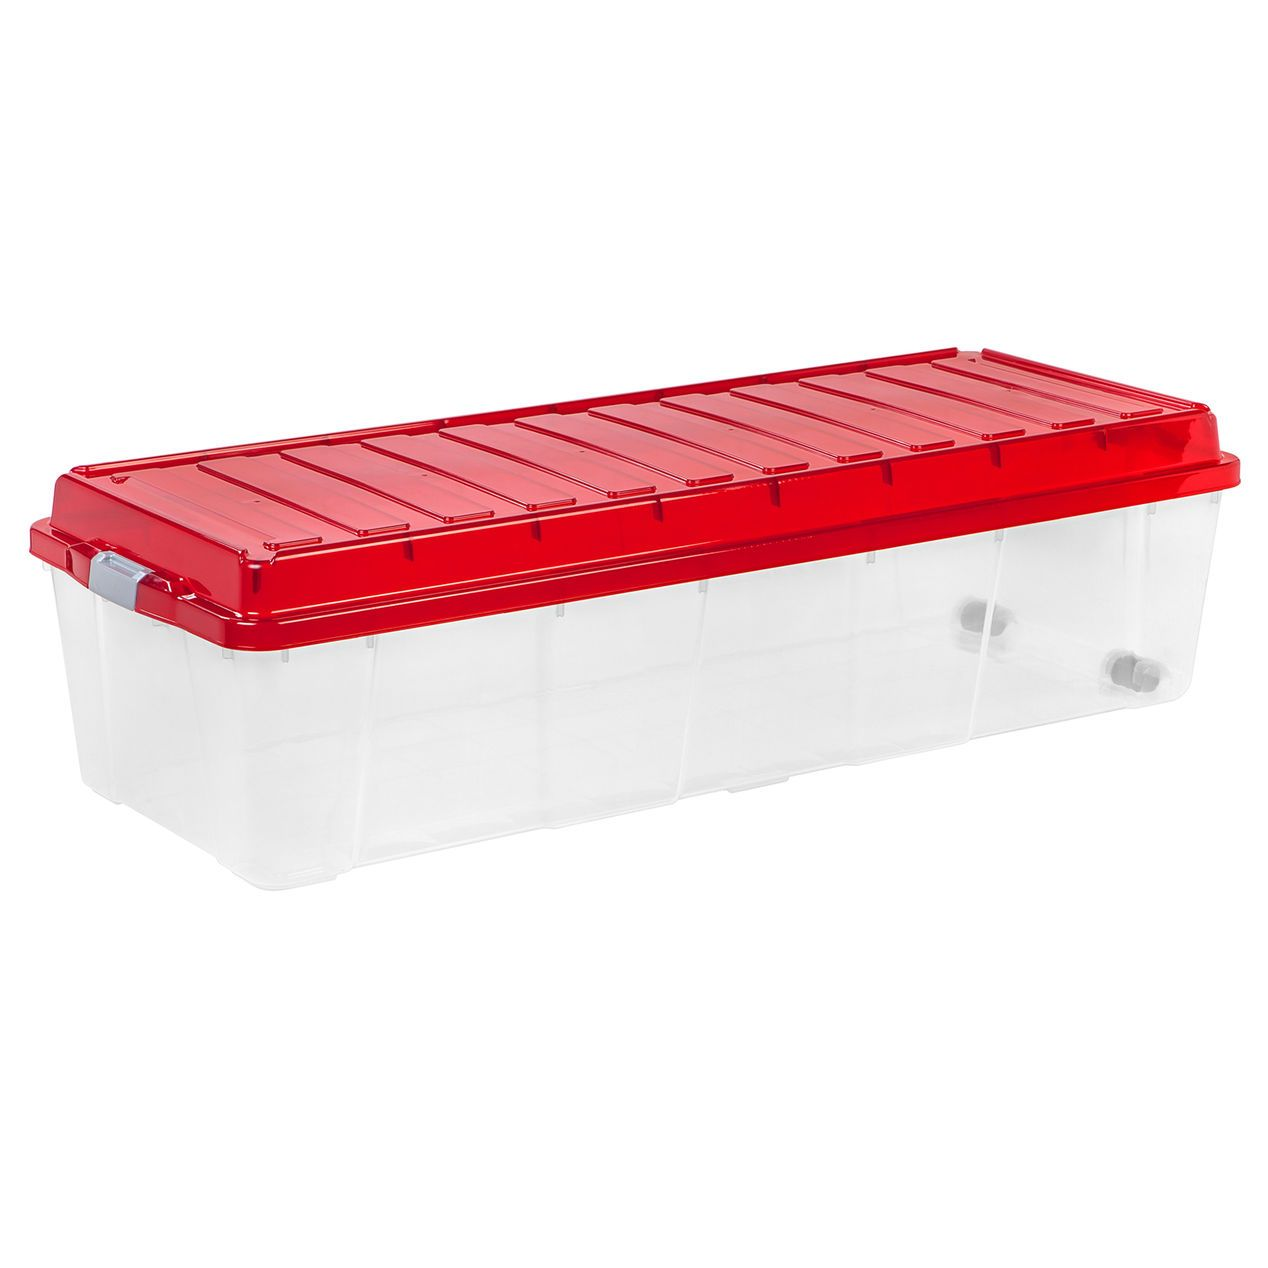 44 Gallon Rectangular Plastic Red Lid Storage Bin Container